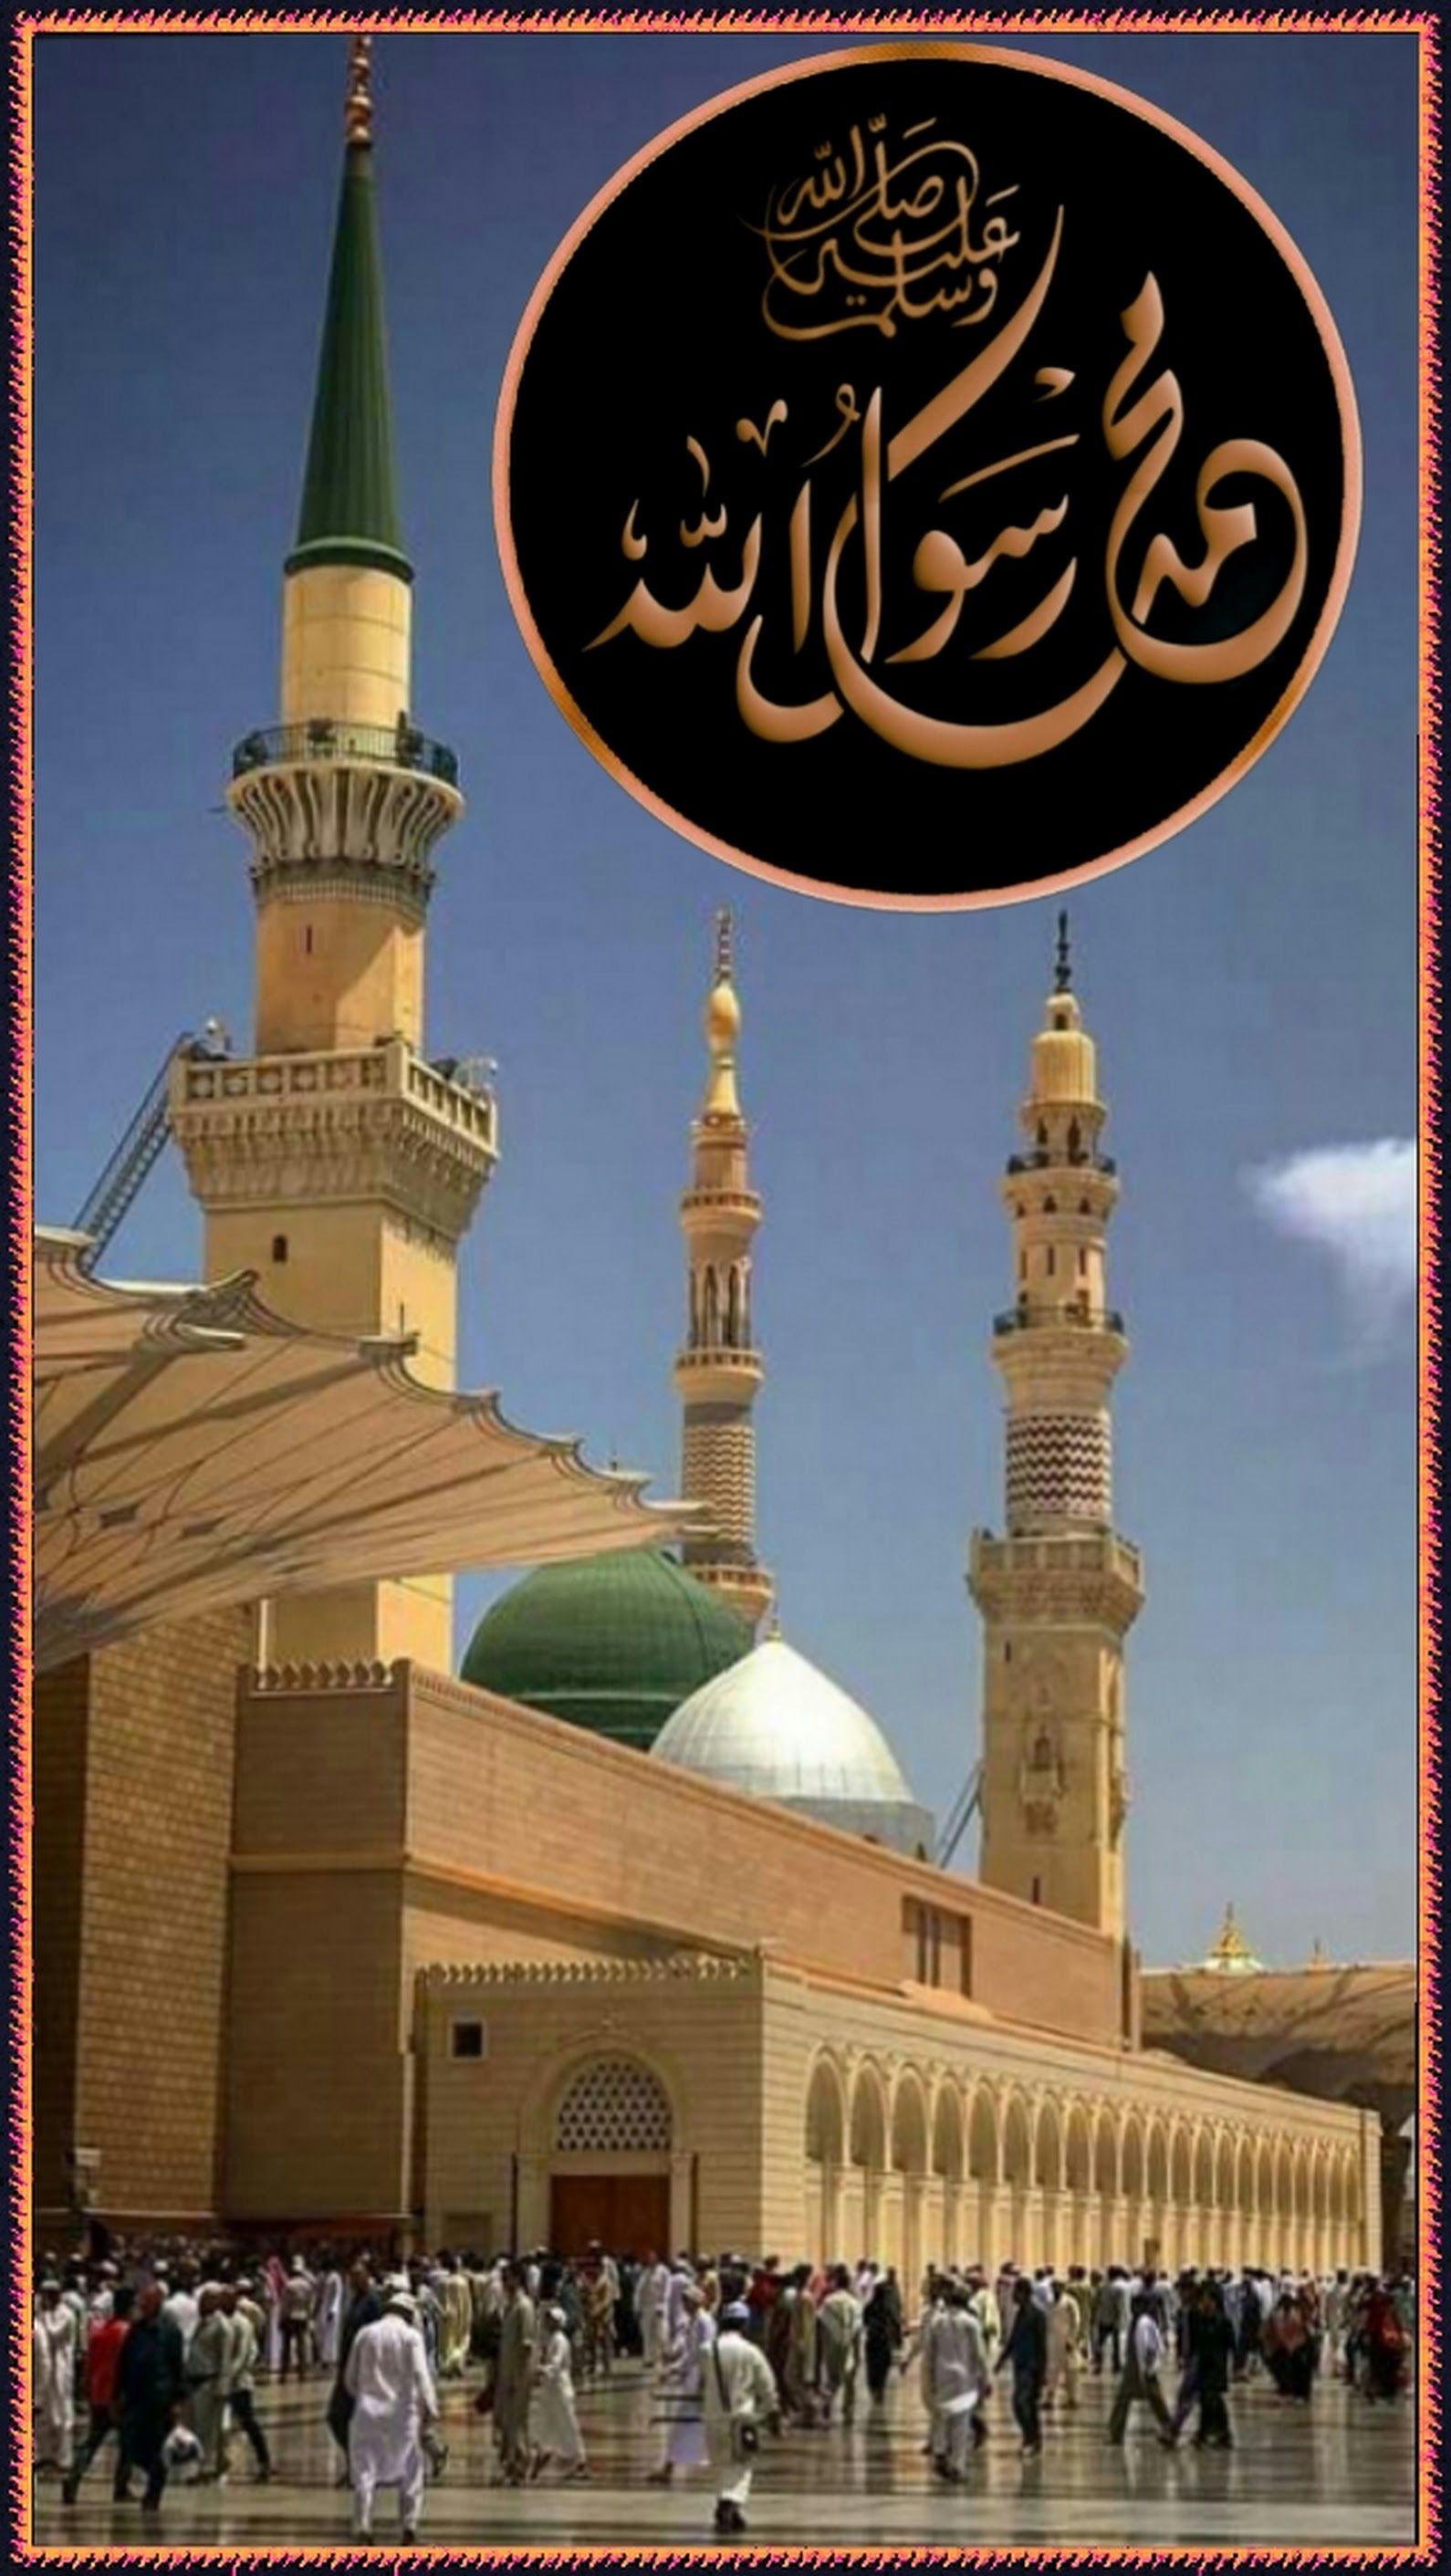 Sign In Beautiful Mosques Medina Saudi Arabia Pakistan Culture